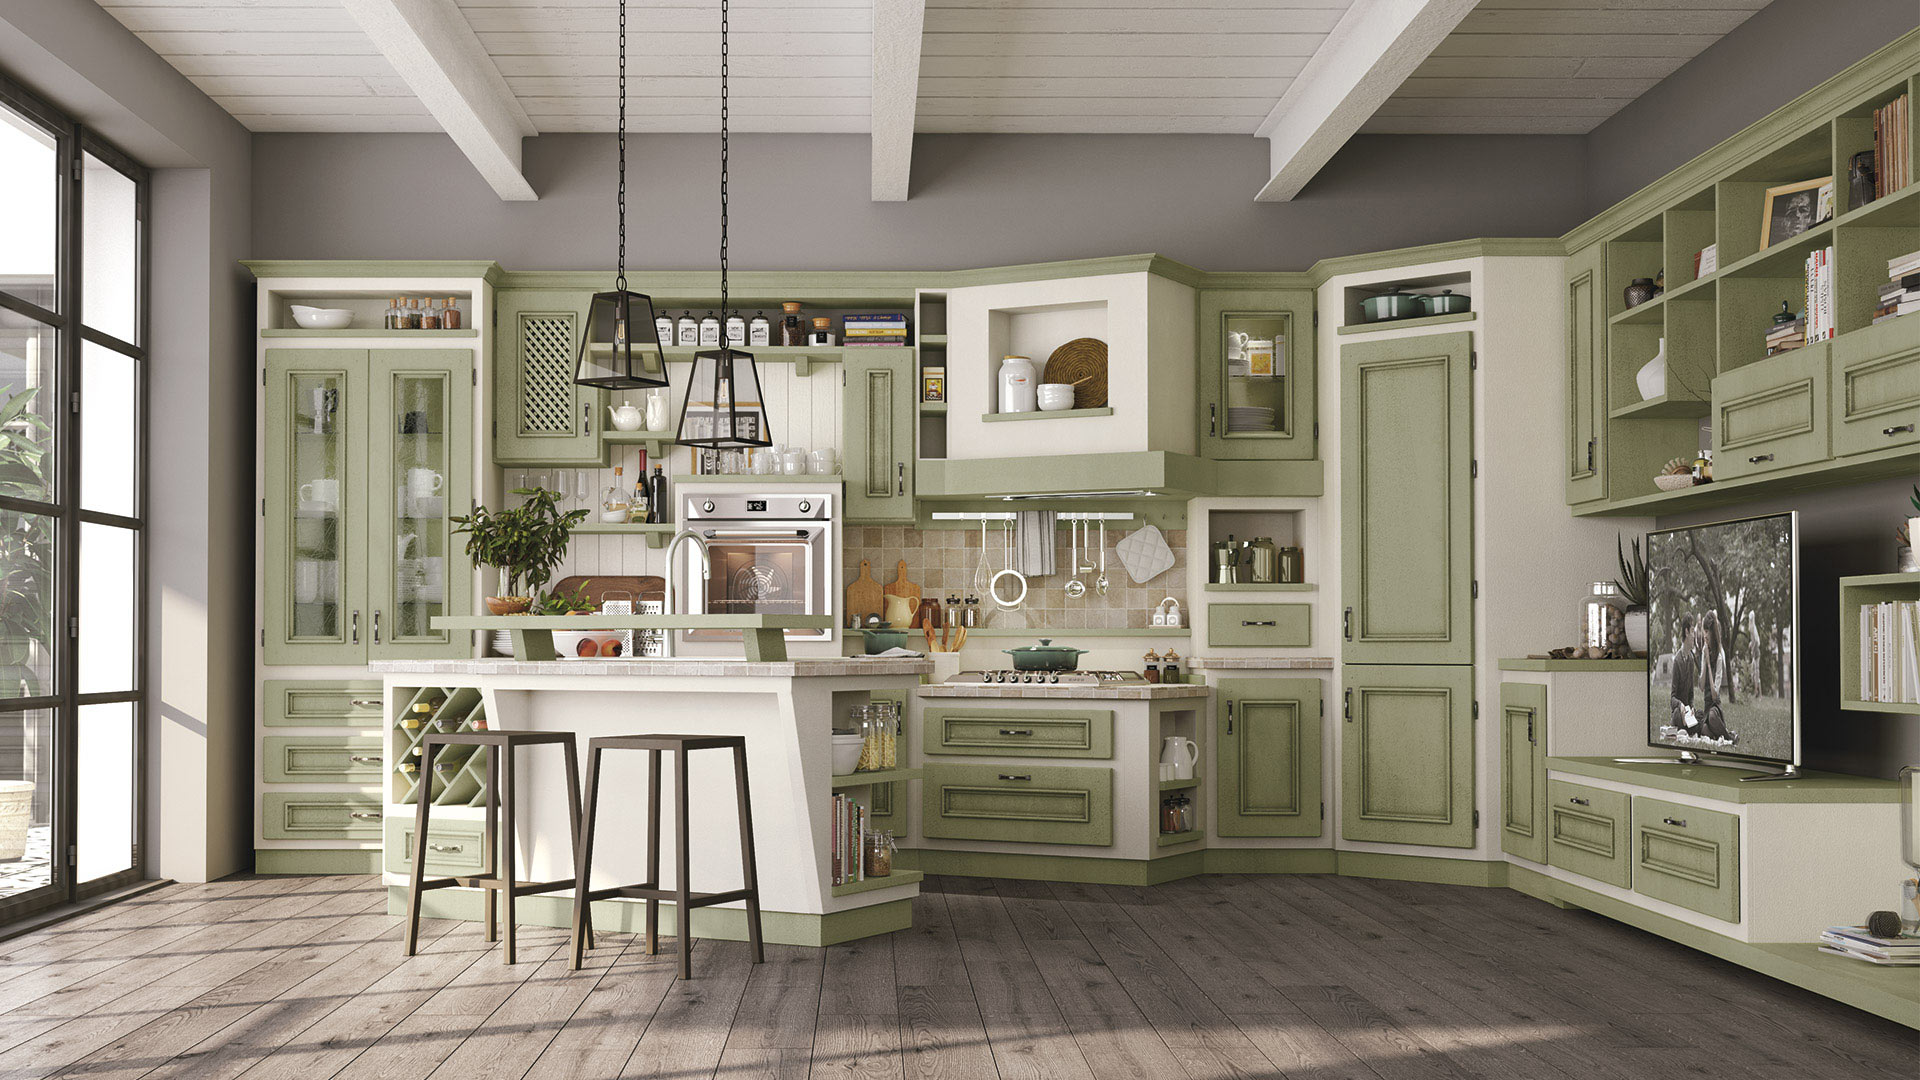 Beatrice cucine borgo antico cucine lube for Cucina middle mondo convenienza